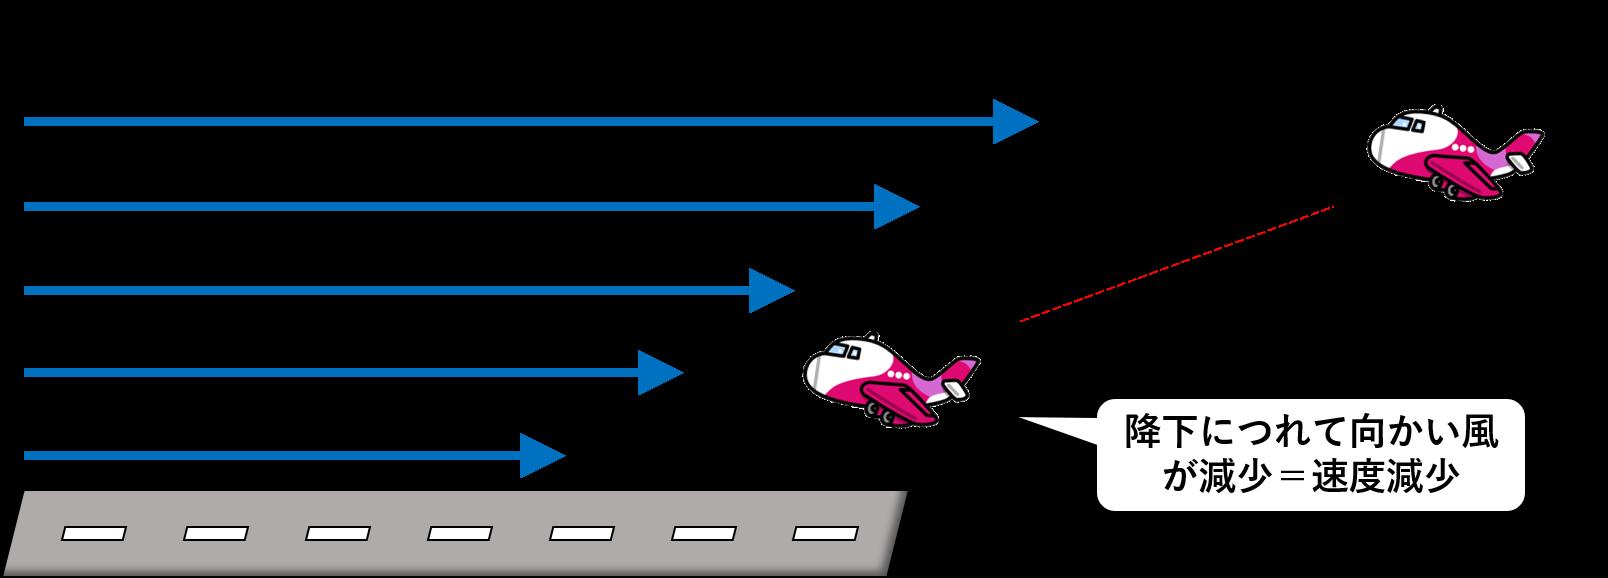 Wind Gradientのイメージ図